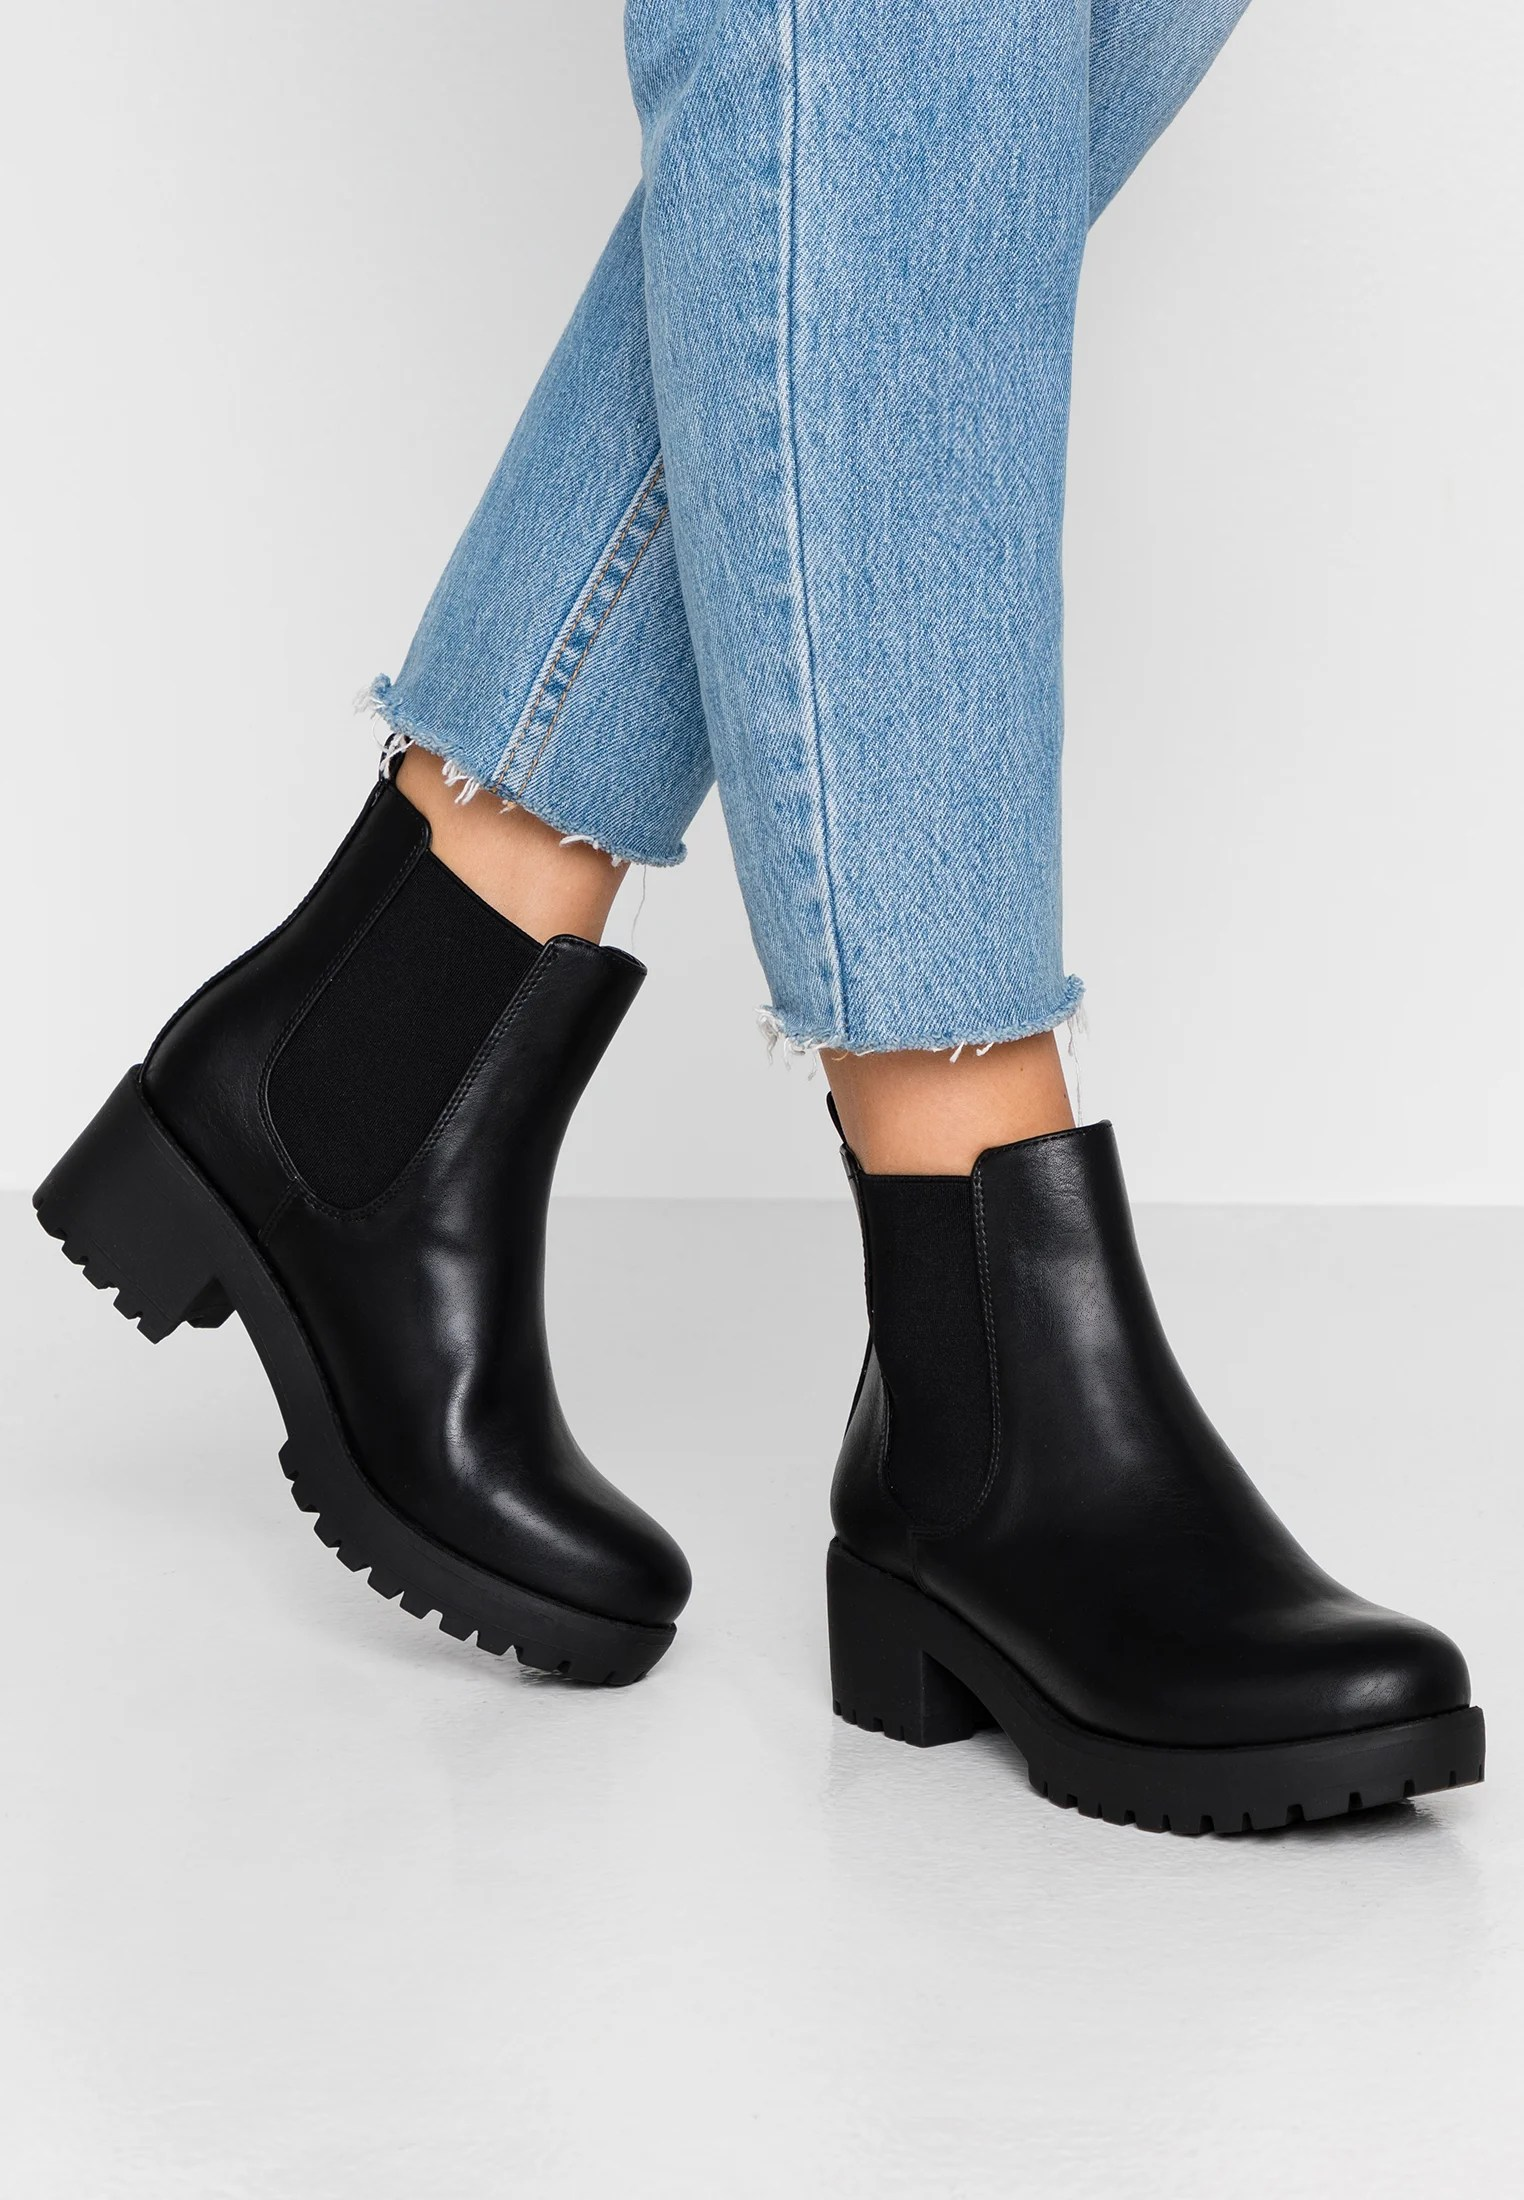 Rubi Shoes by Cotton On KENNEDY GUSSET - Boots à talons - black - ZALANDO.FR